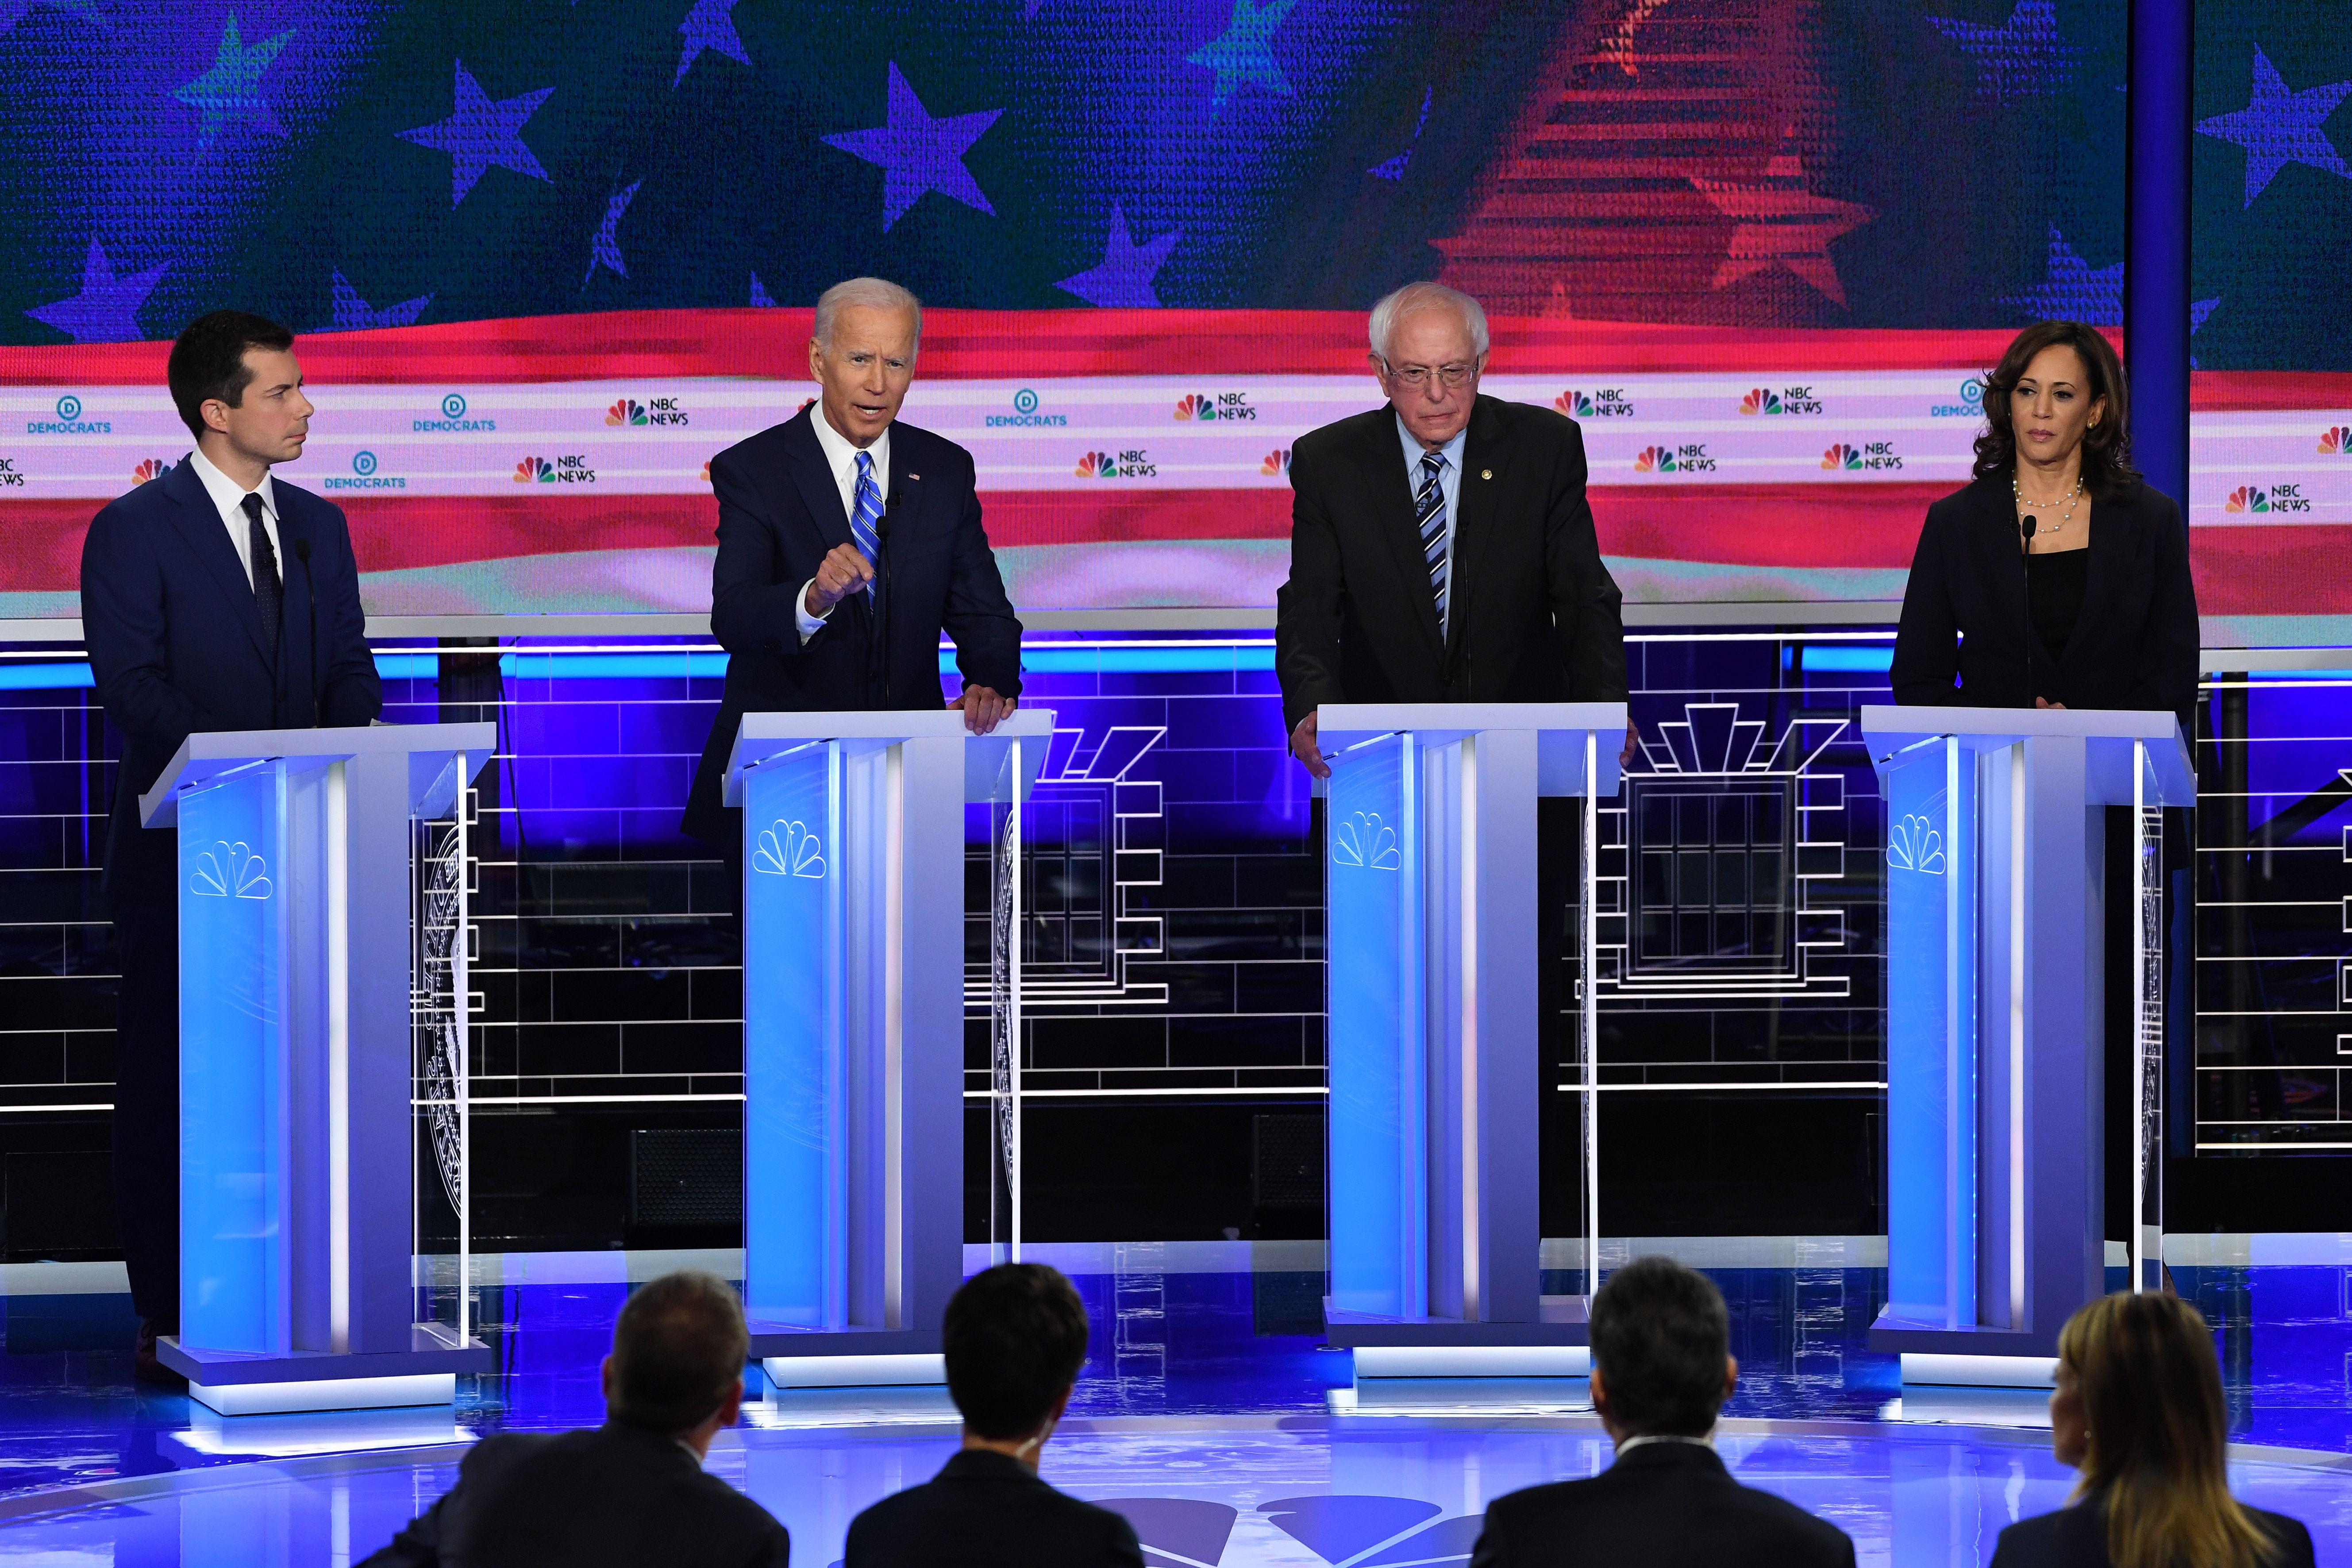 Democratic Party presidential hopefuls debate in Miami, Florida, on Thursday night.